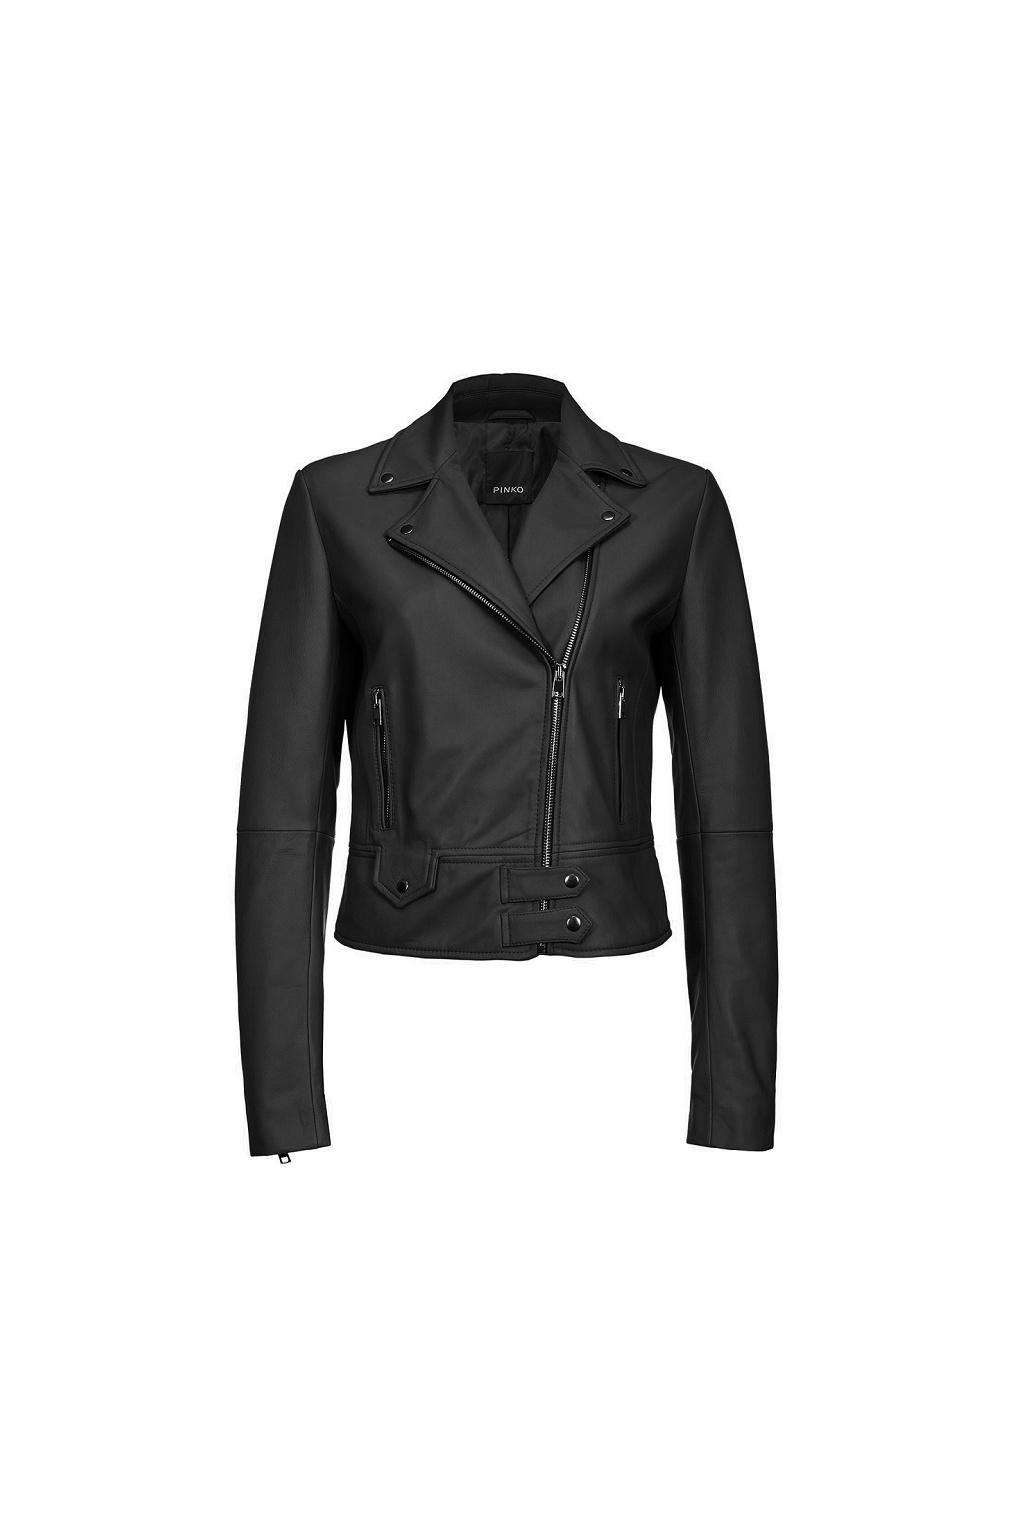 Dámská kožená bunda Pinko Sensibile 11 černá